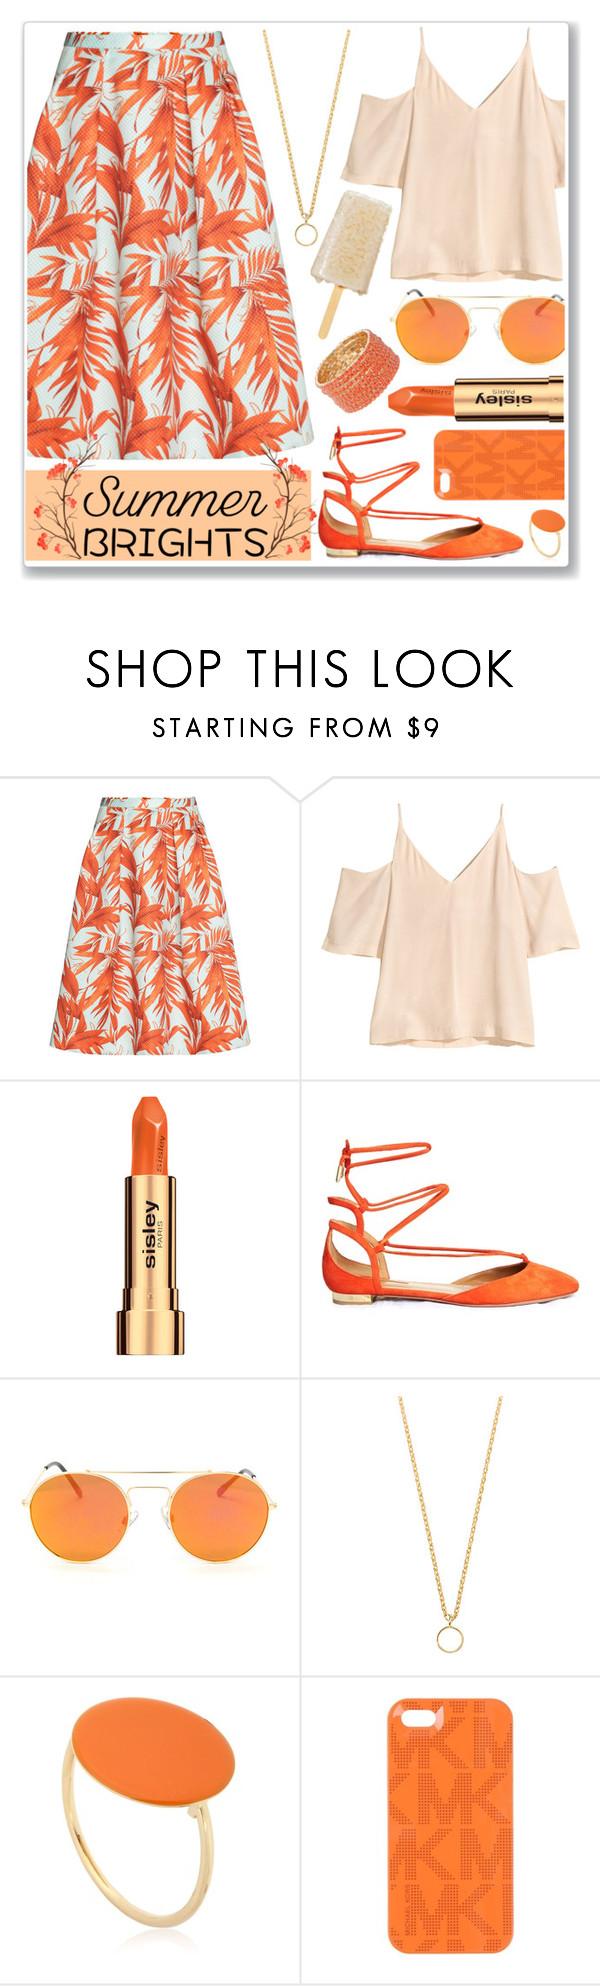 """Summer Brights: Orange"" by anamarija00 ❤ liked on Polyvore featuring H&M, Sisley, Aquazzura, Glenda López, Isabel Marant, Michael Kors and summerbrights"